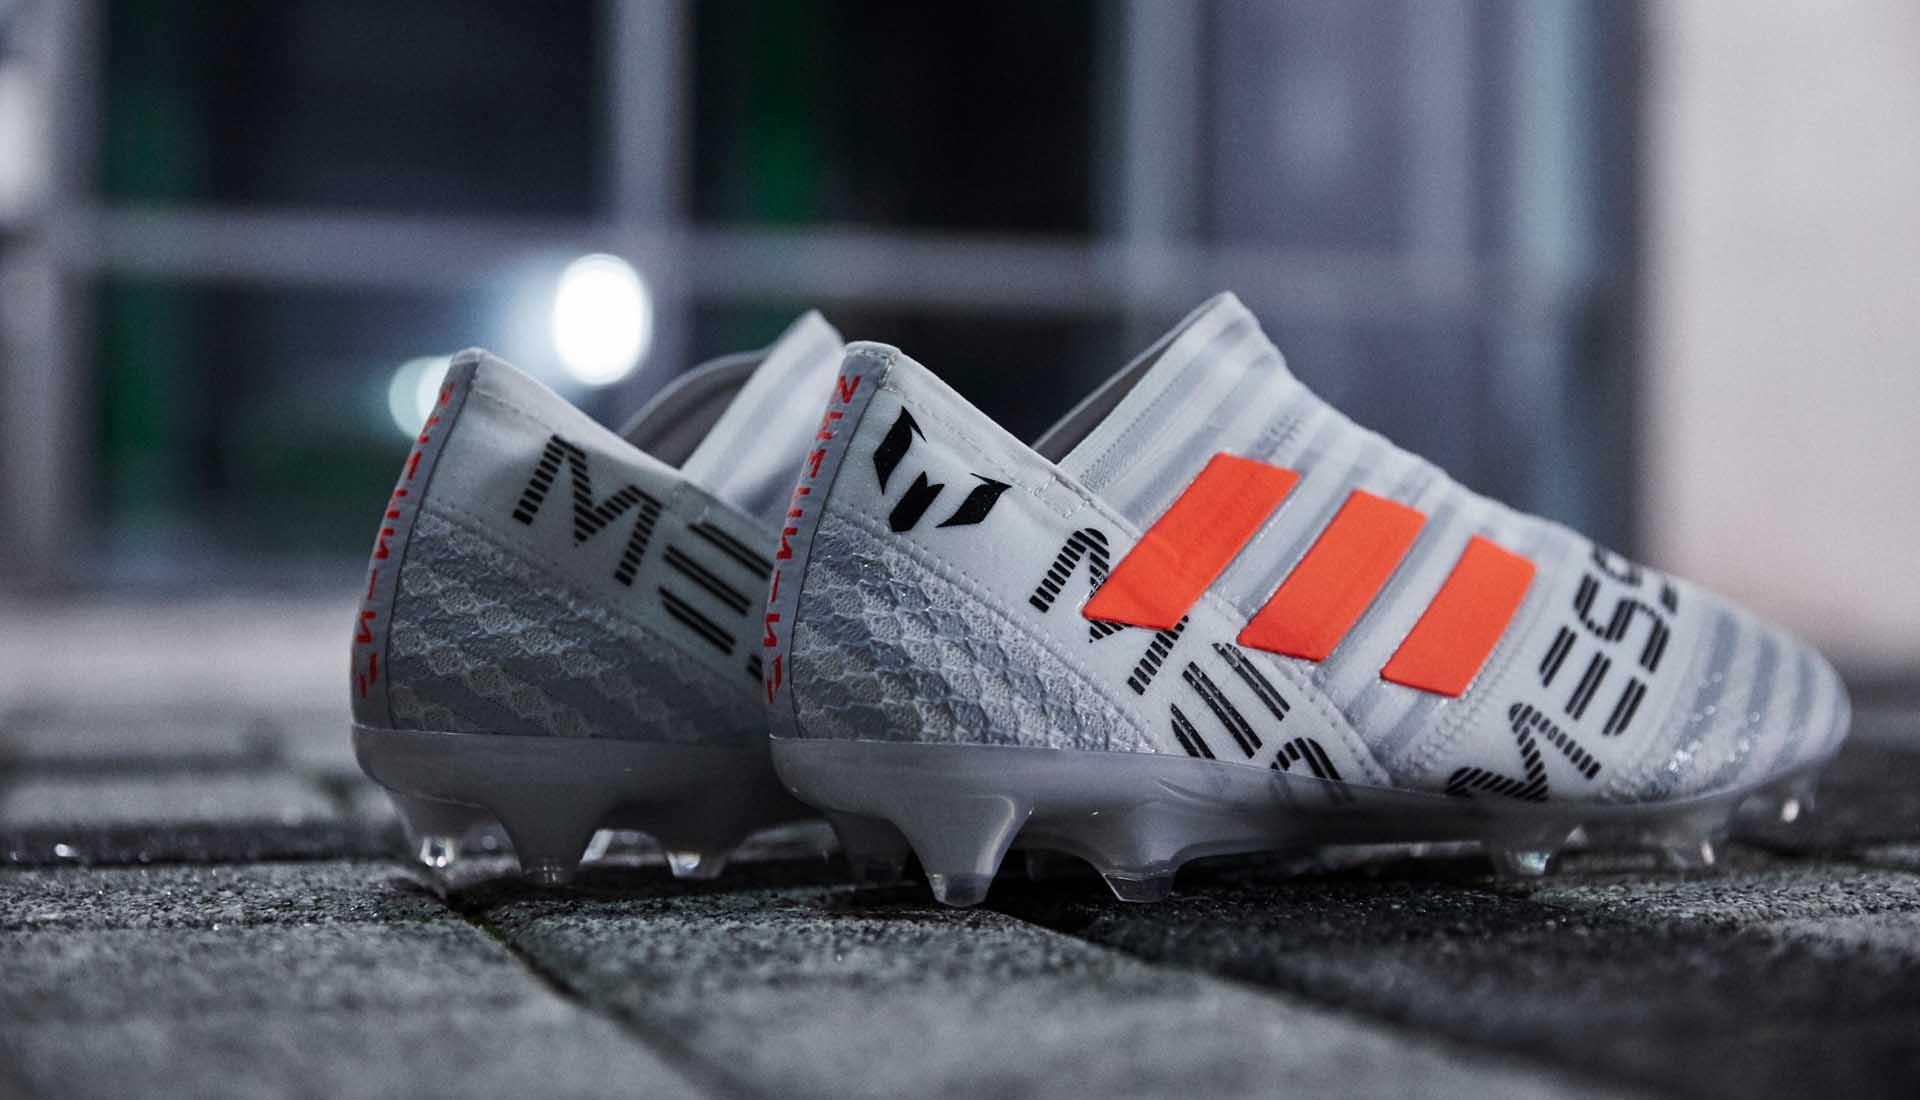 chaussure-adidas-football-nemeziz-messi-pyro-storm-octobre-2017-4